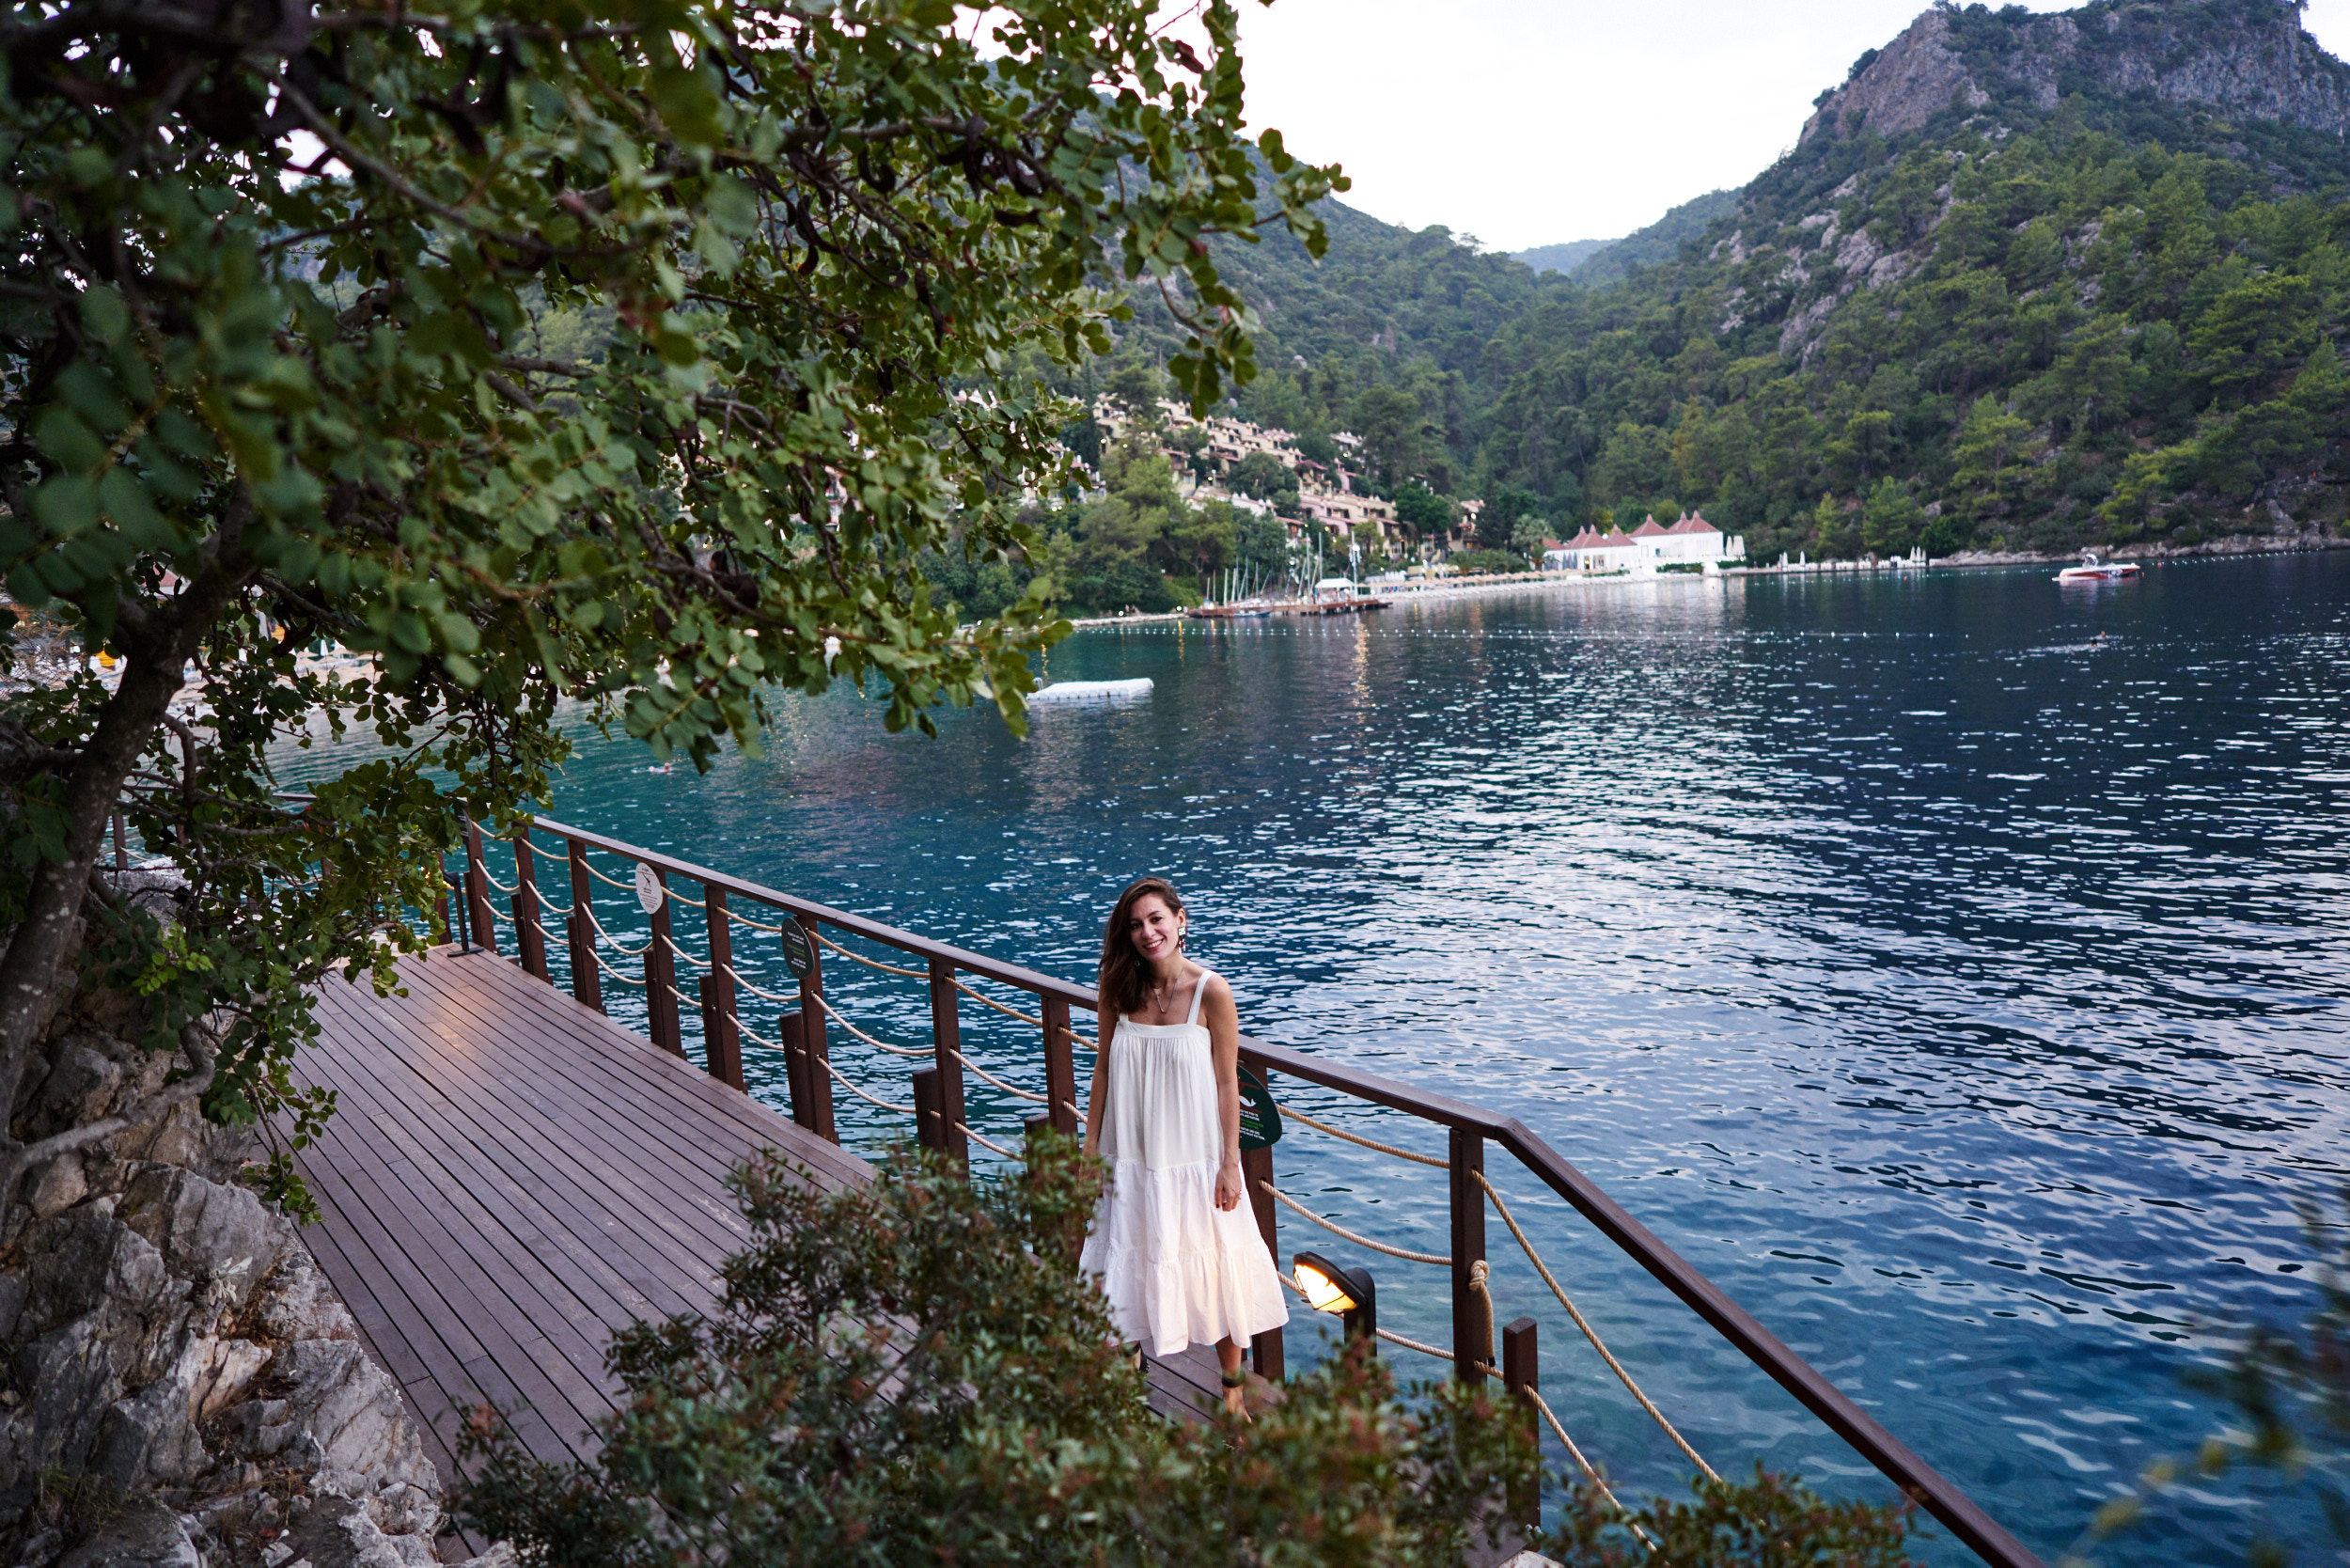 billur saatci, offnegiysem, street style, turkish style blogger, hillside beach club, sunset, heaven on earth,